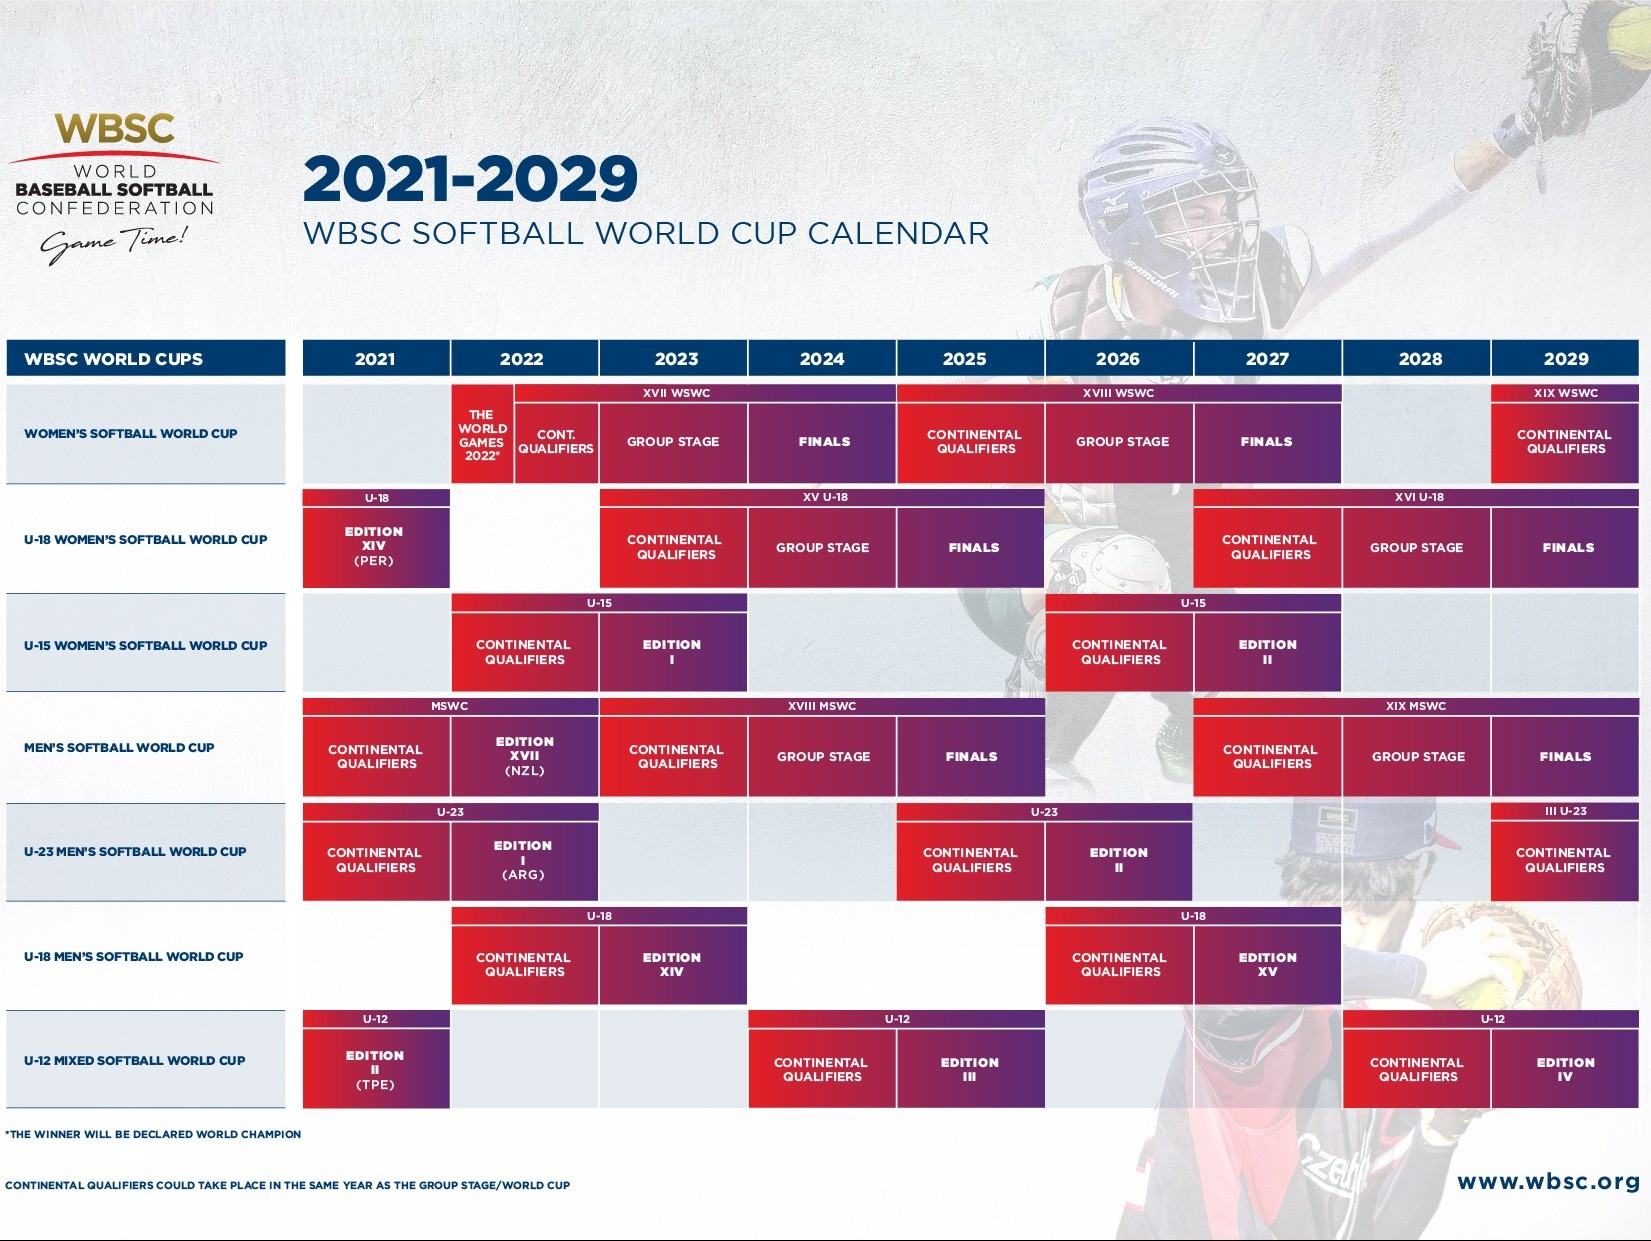 WBSC lanza nuevo formato de Copa Mundial de Softbol, calendario global 2021-2029